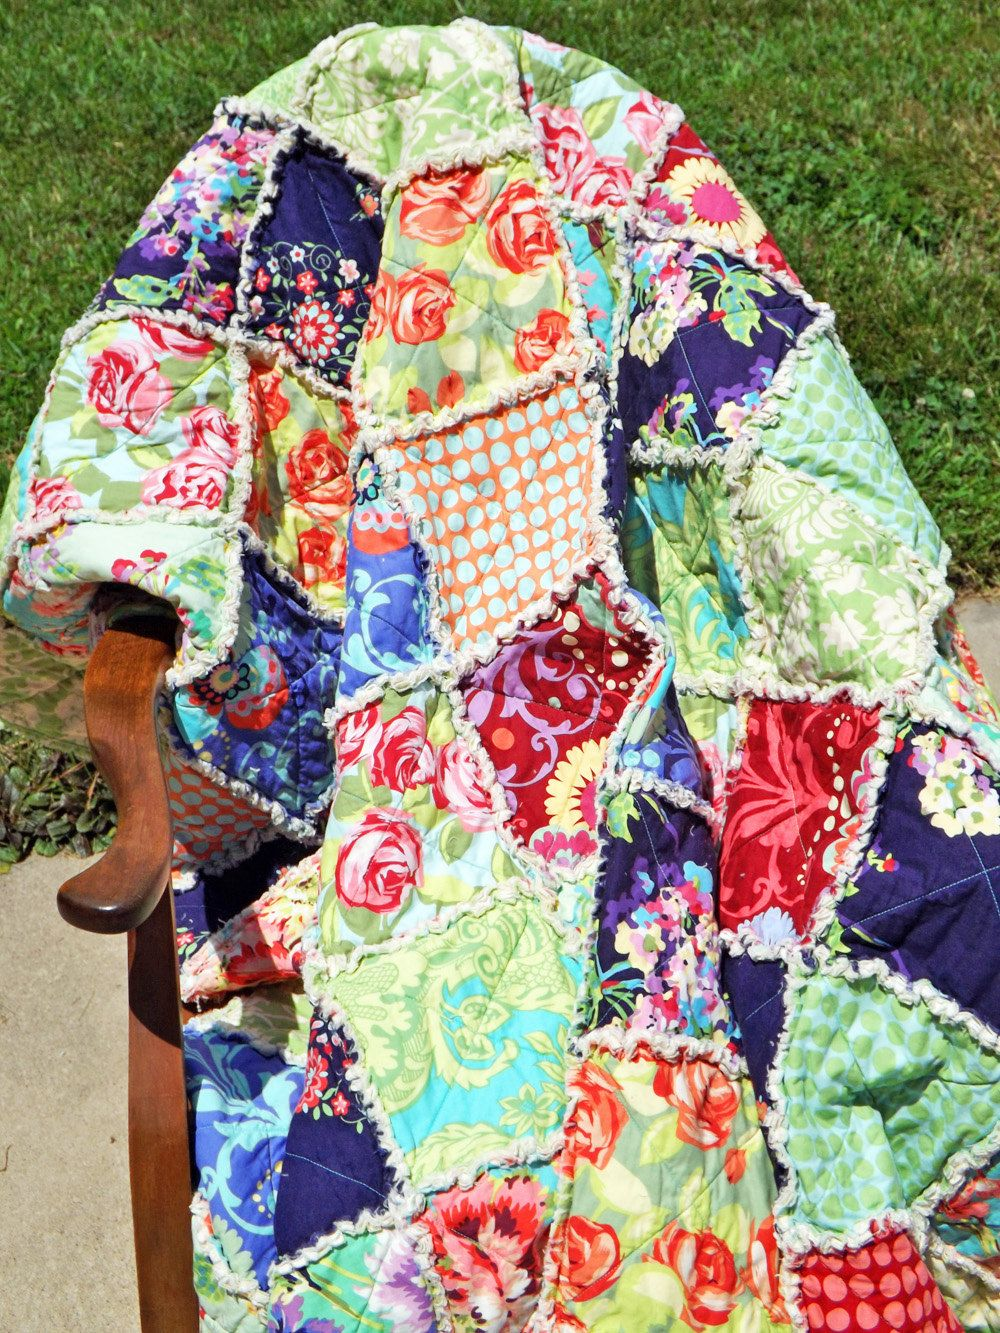 Rag Quilt Full Size Quilt Pick Your Fabrics Cozy